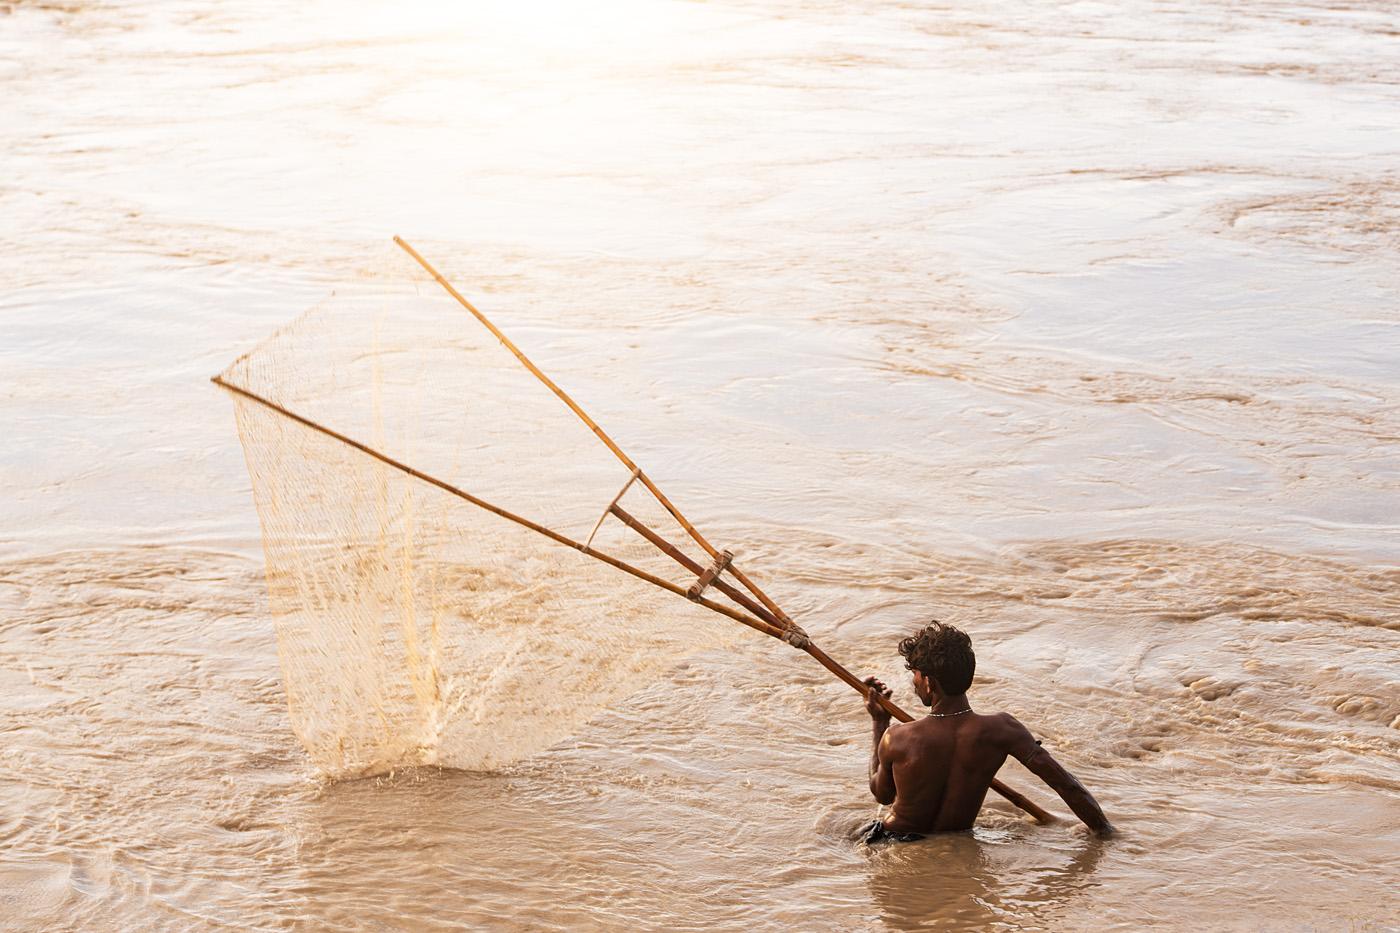 River fishing #1